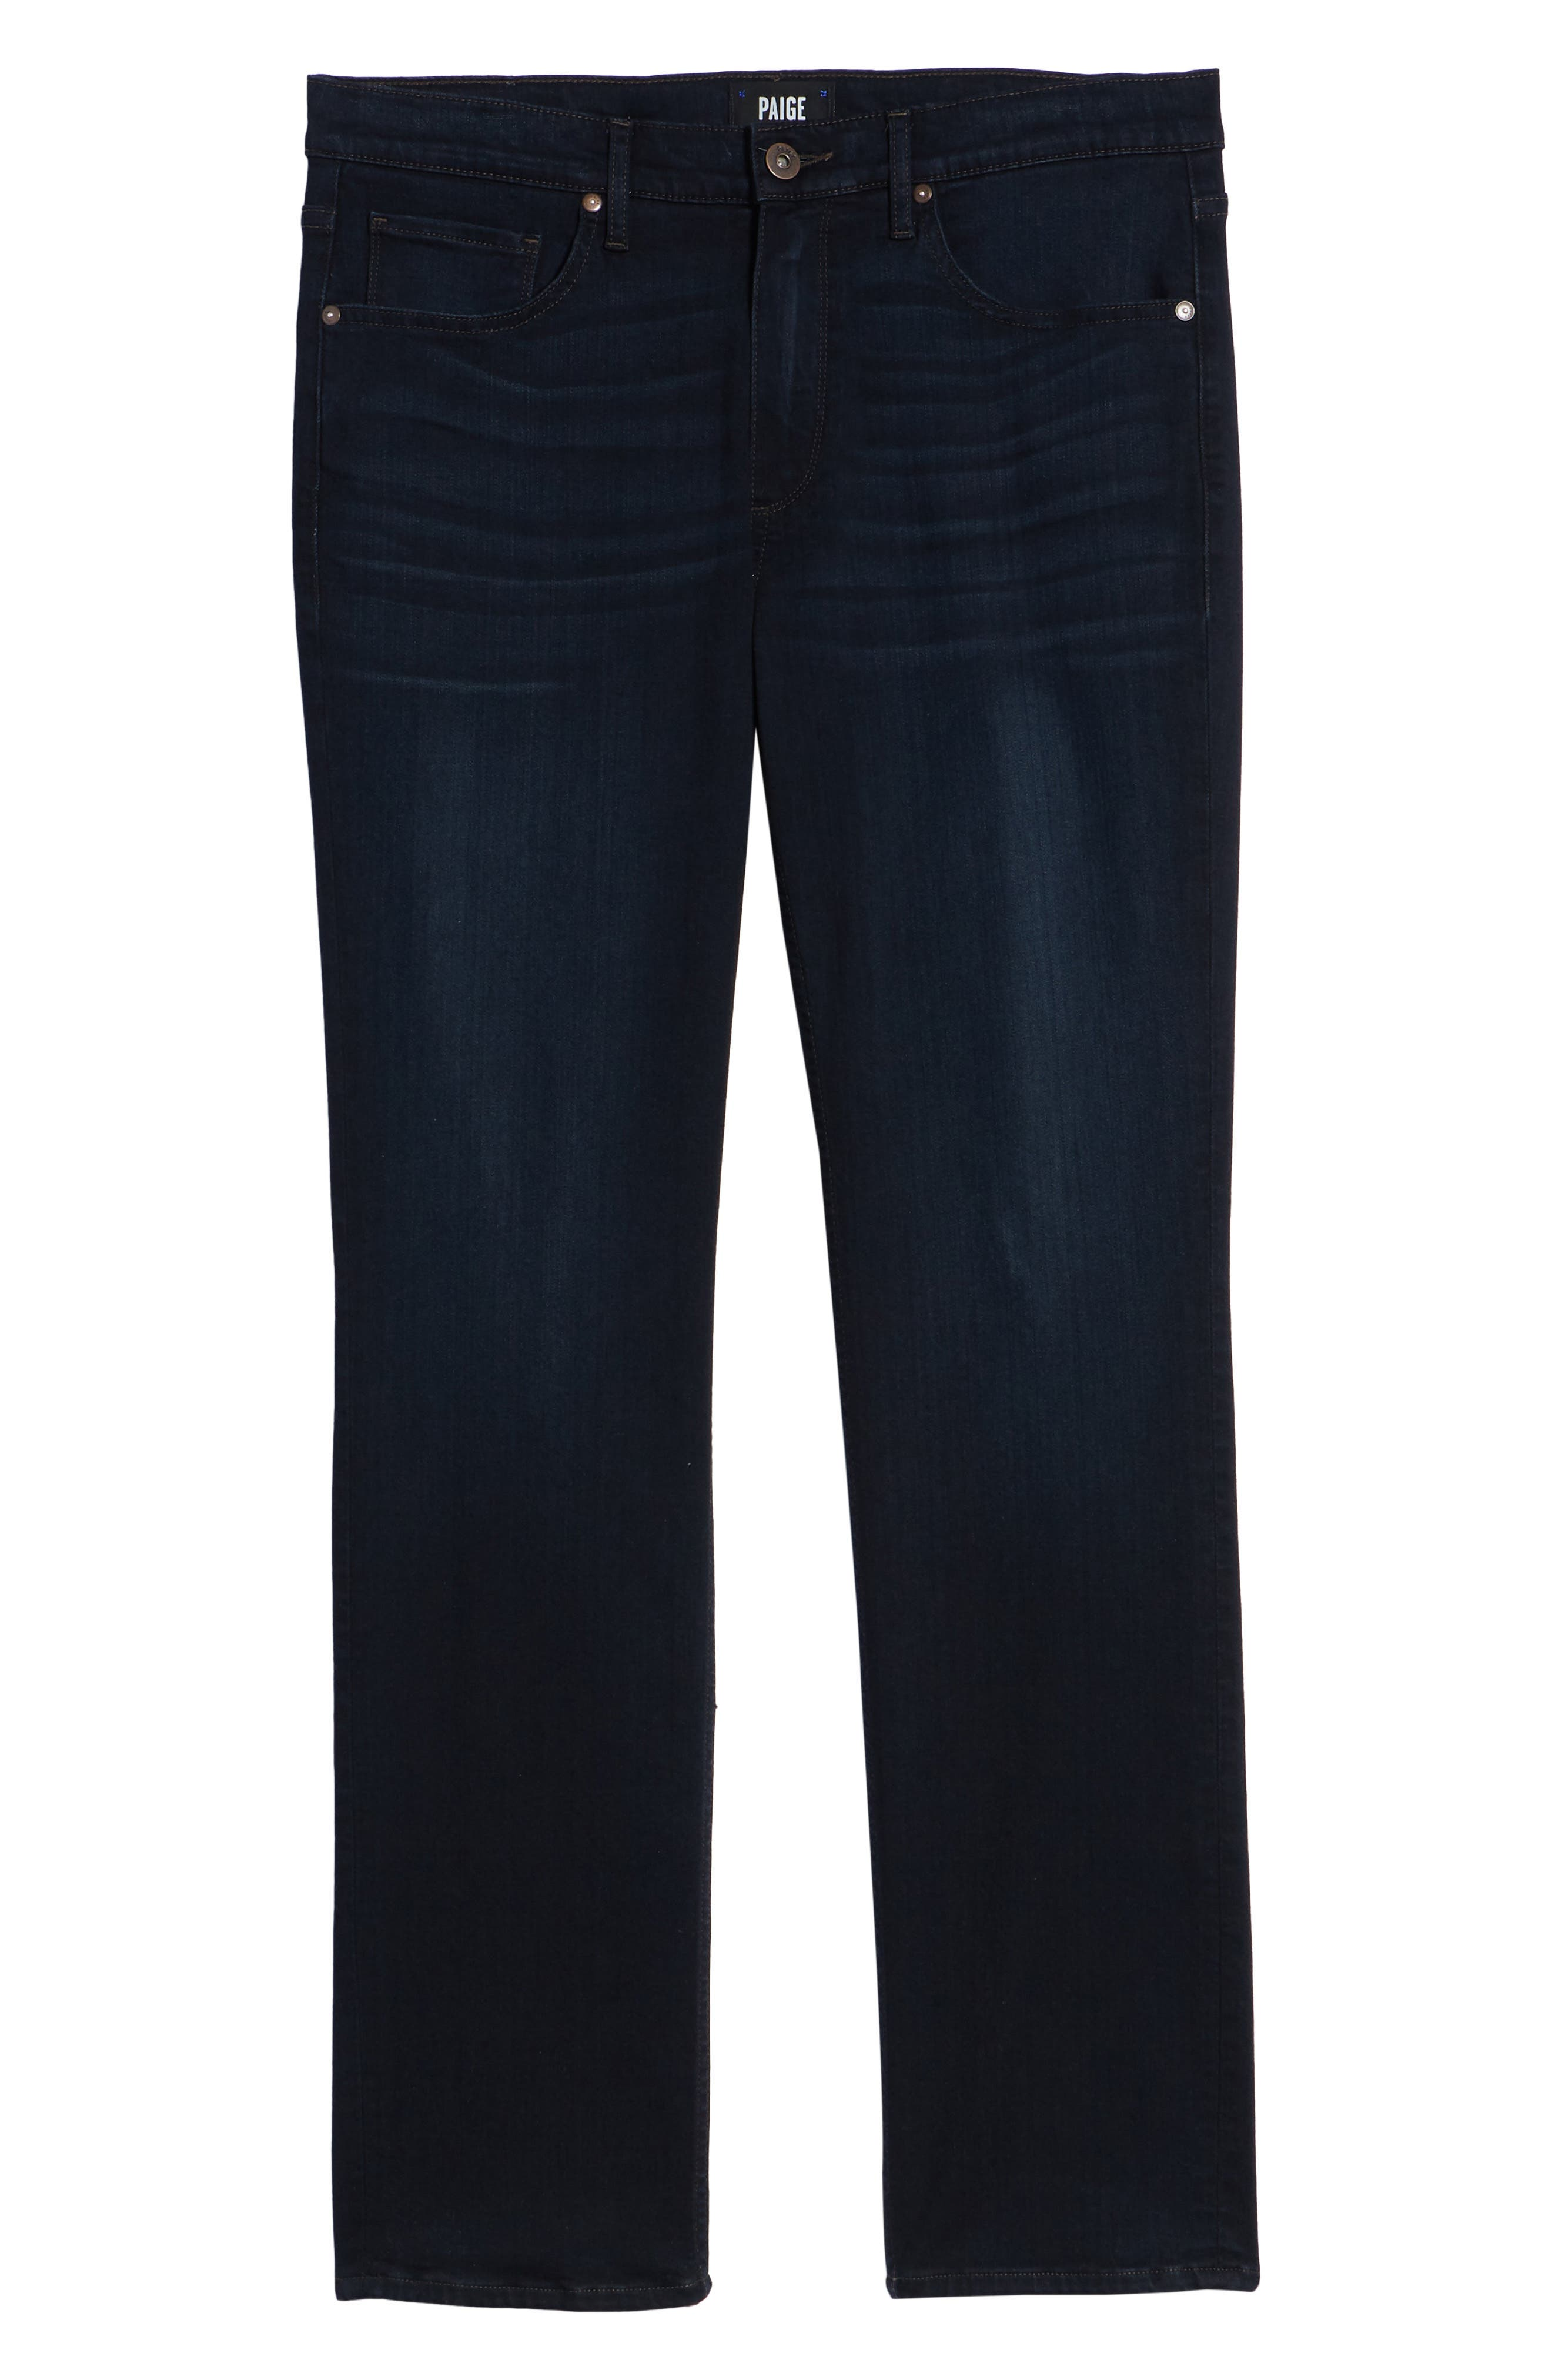 Normandie Straight Leg Jeans,                             Alternate thumbnail 6, color,                             FLEET